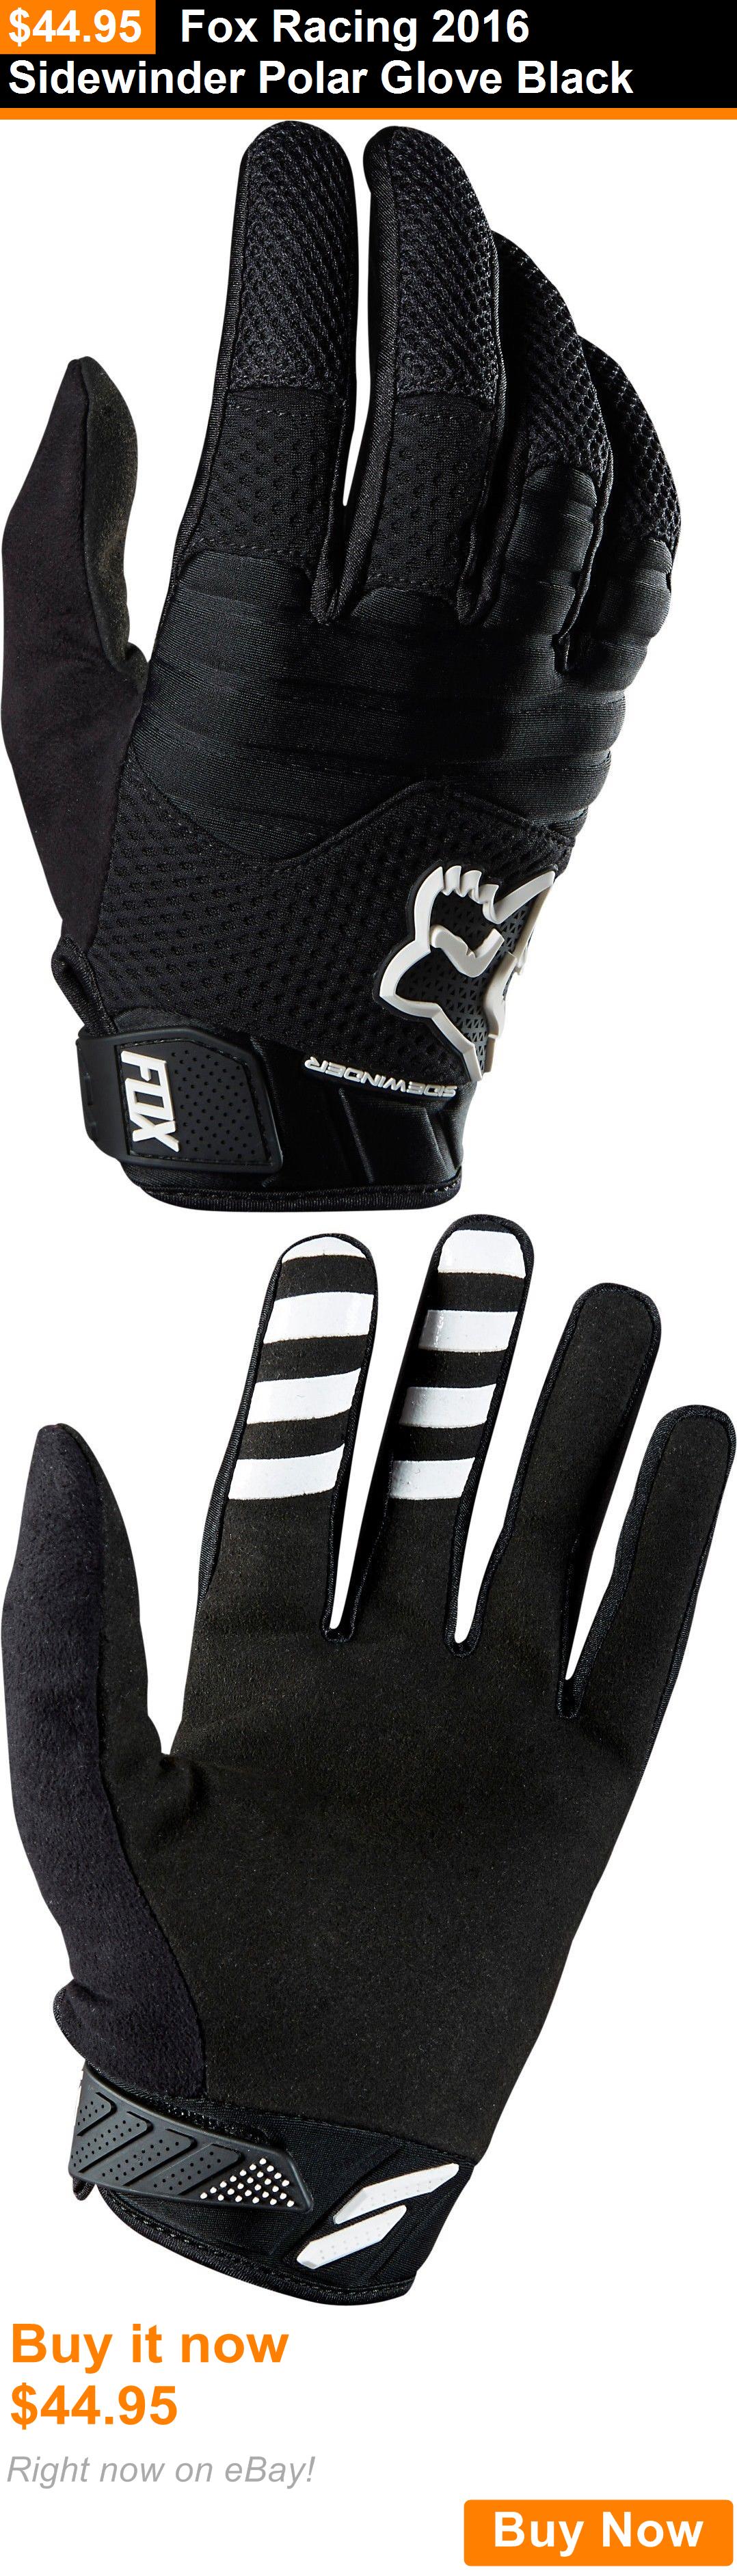 Gloves fox racing sidewinder polar glove black buy it